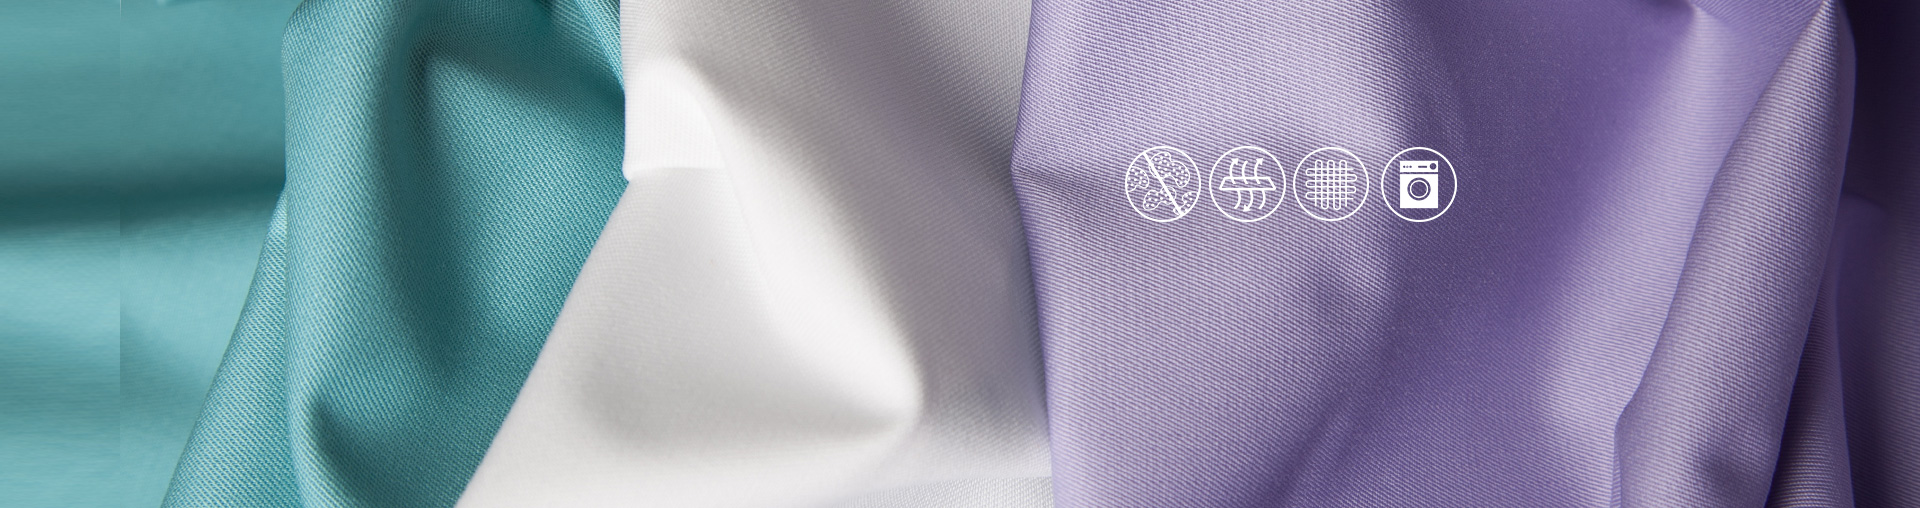 Fabrics for healthcare